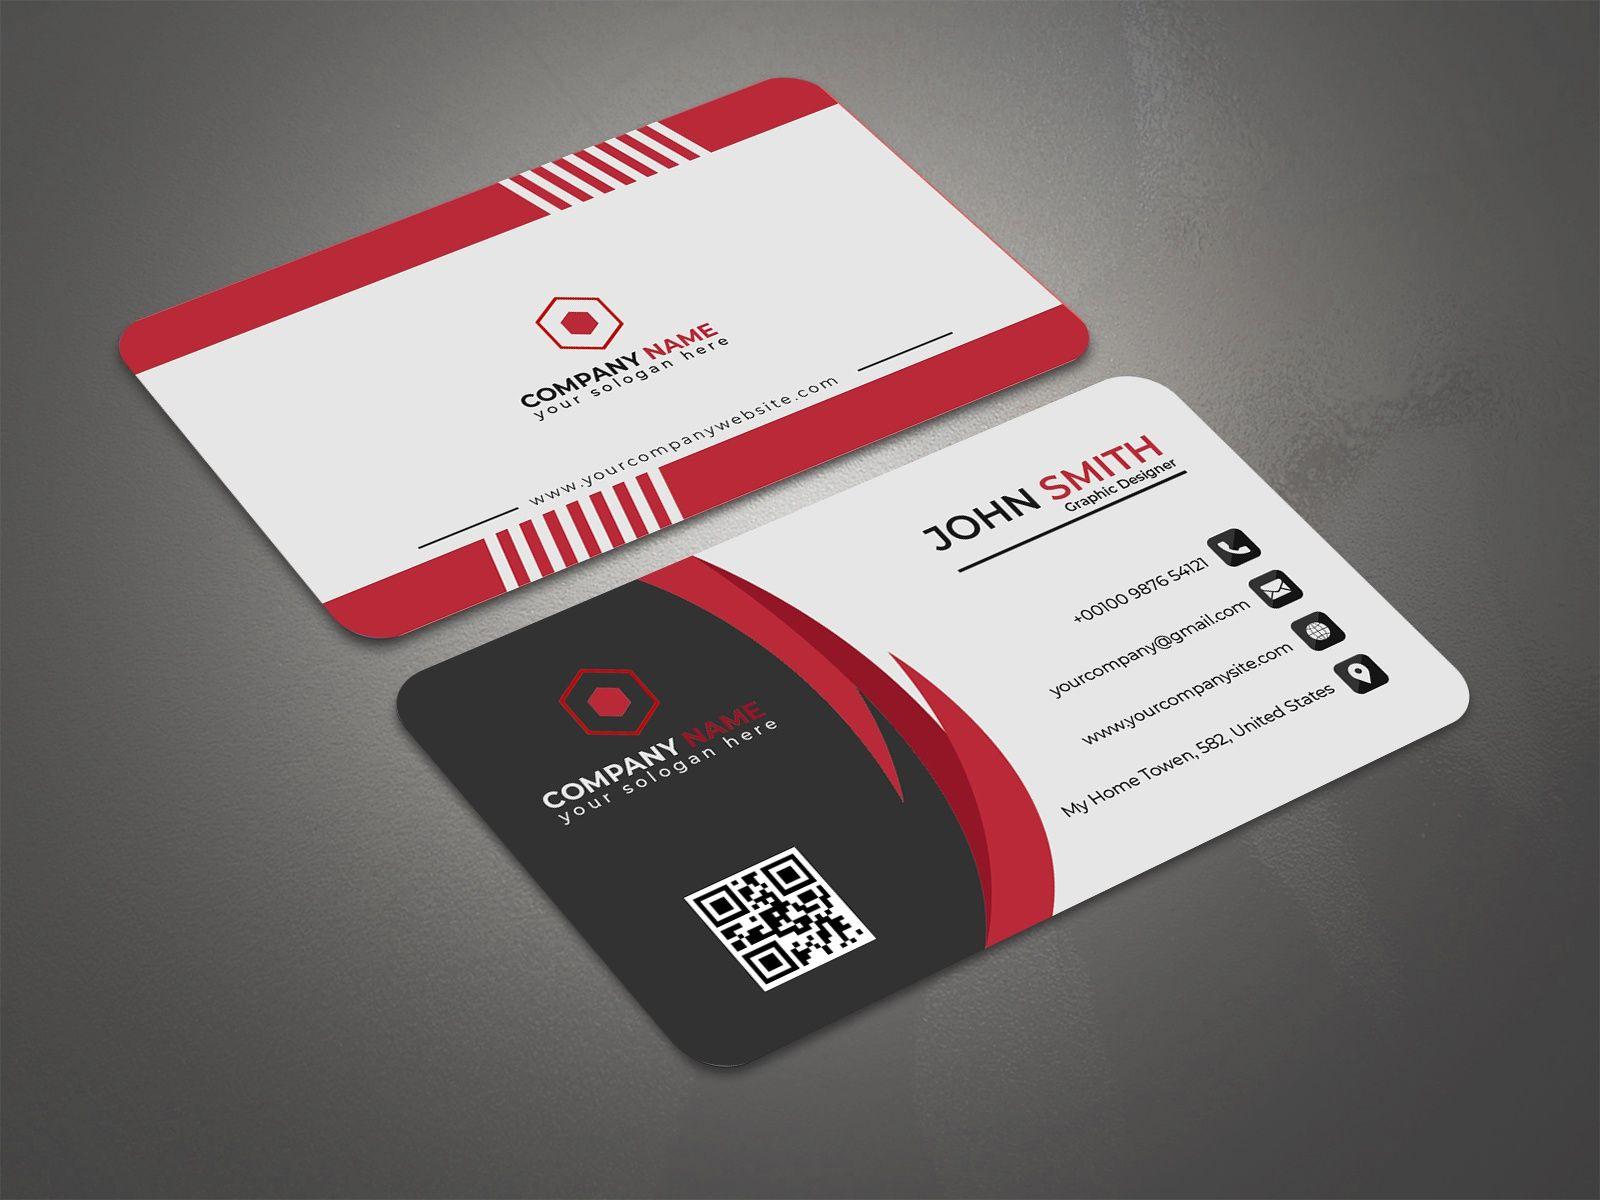 Business Card Design Business Card Maker Business Card Design Business Card Template Design